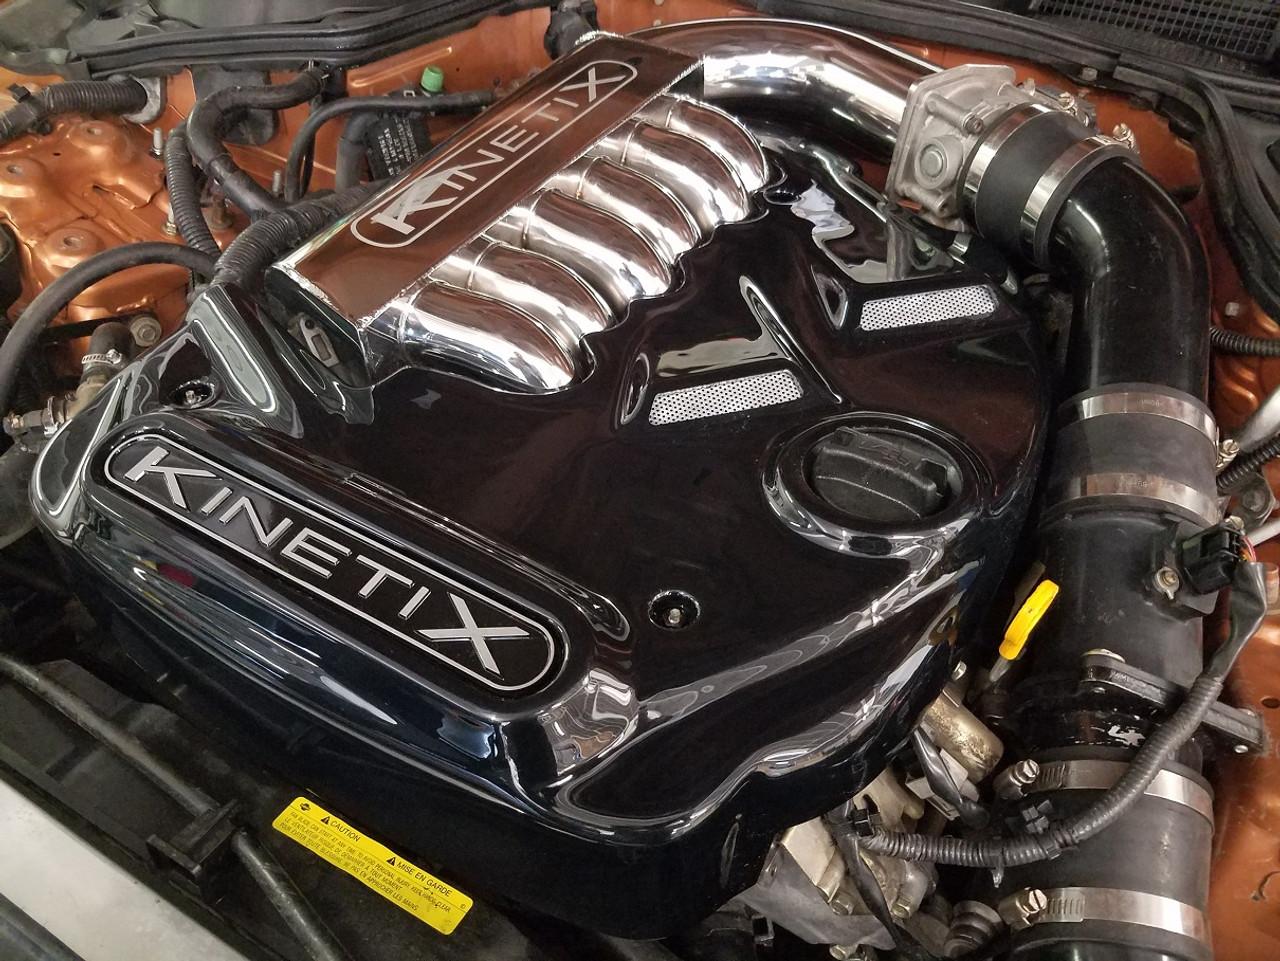 medium resolution of kinetix gloss black polycarbonate engine cover velocity manifold 03 350z parts diagram engine covers